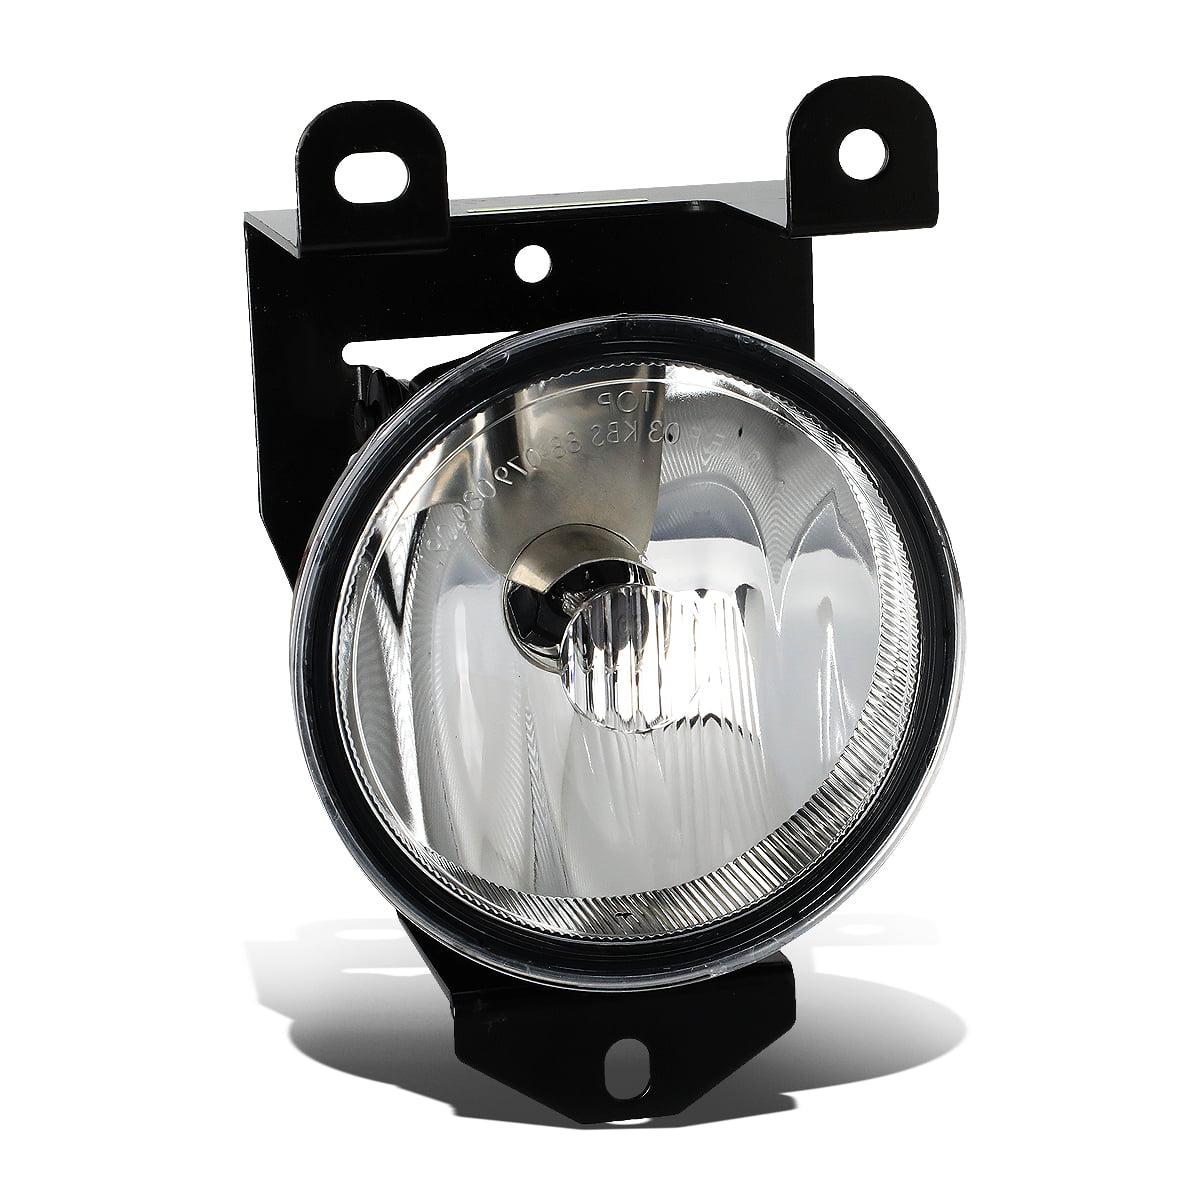 For 92-07 GMC Yukon/Sierra C3 Denali/Cadillac Escalade Factory Style Right Side Fog Light/Lamp 93 94 95 96 97 98 99 00 01 02 03 04 05 06